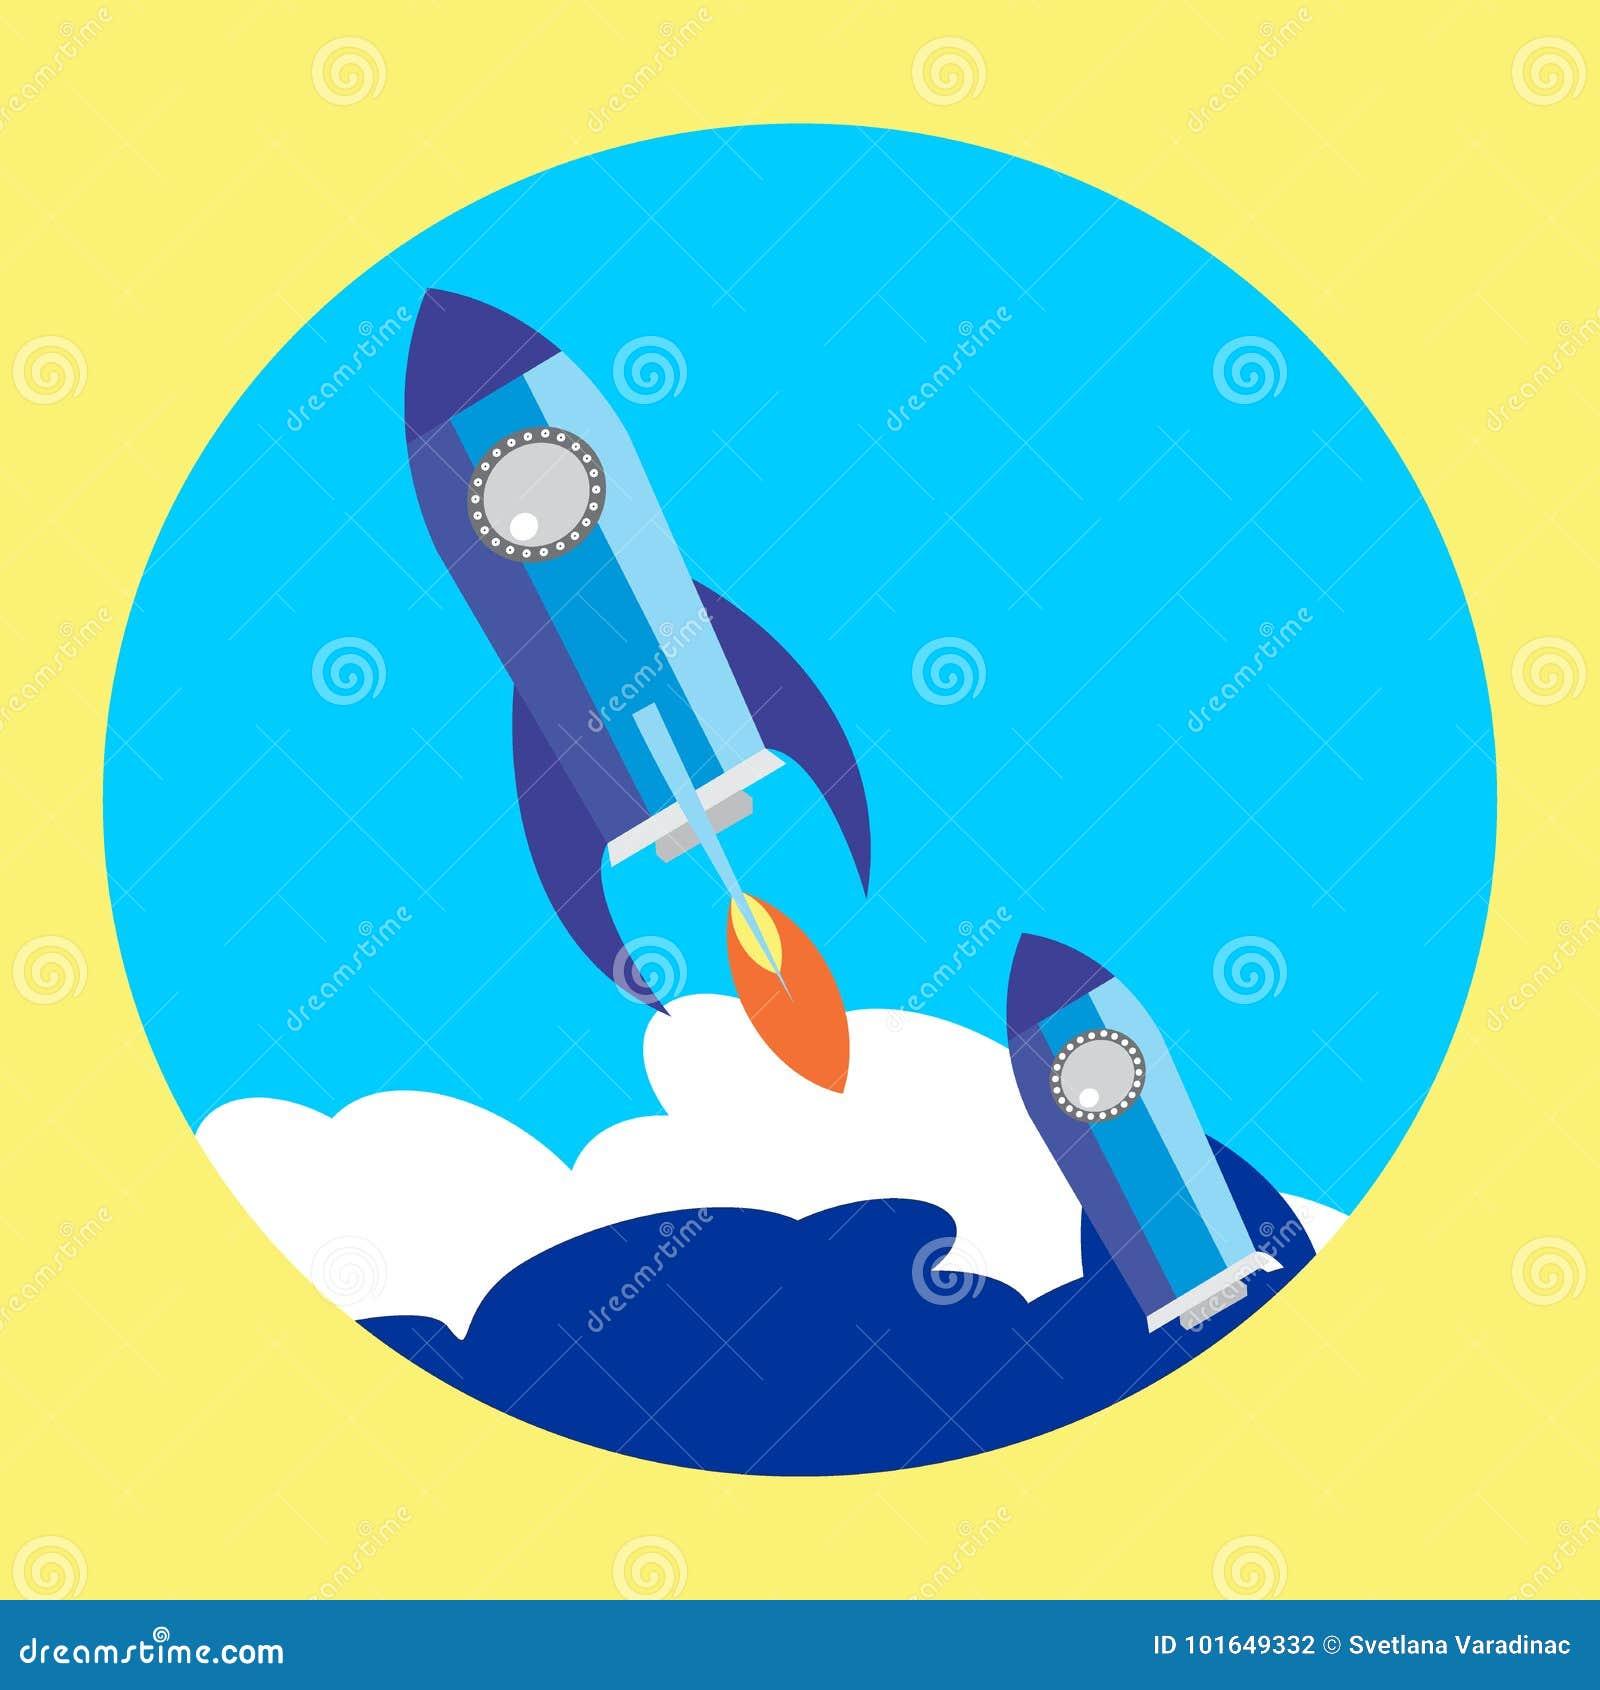 Flat Space Shuttle Rocket Circle Icon